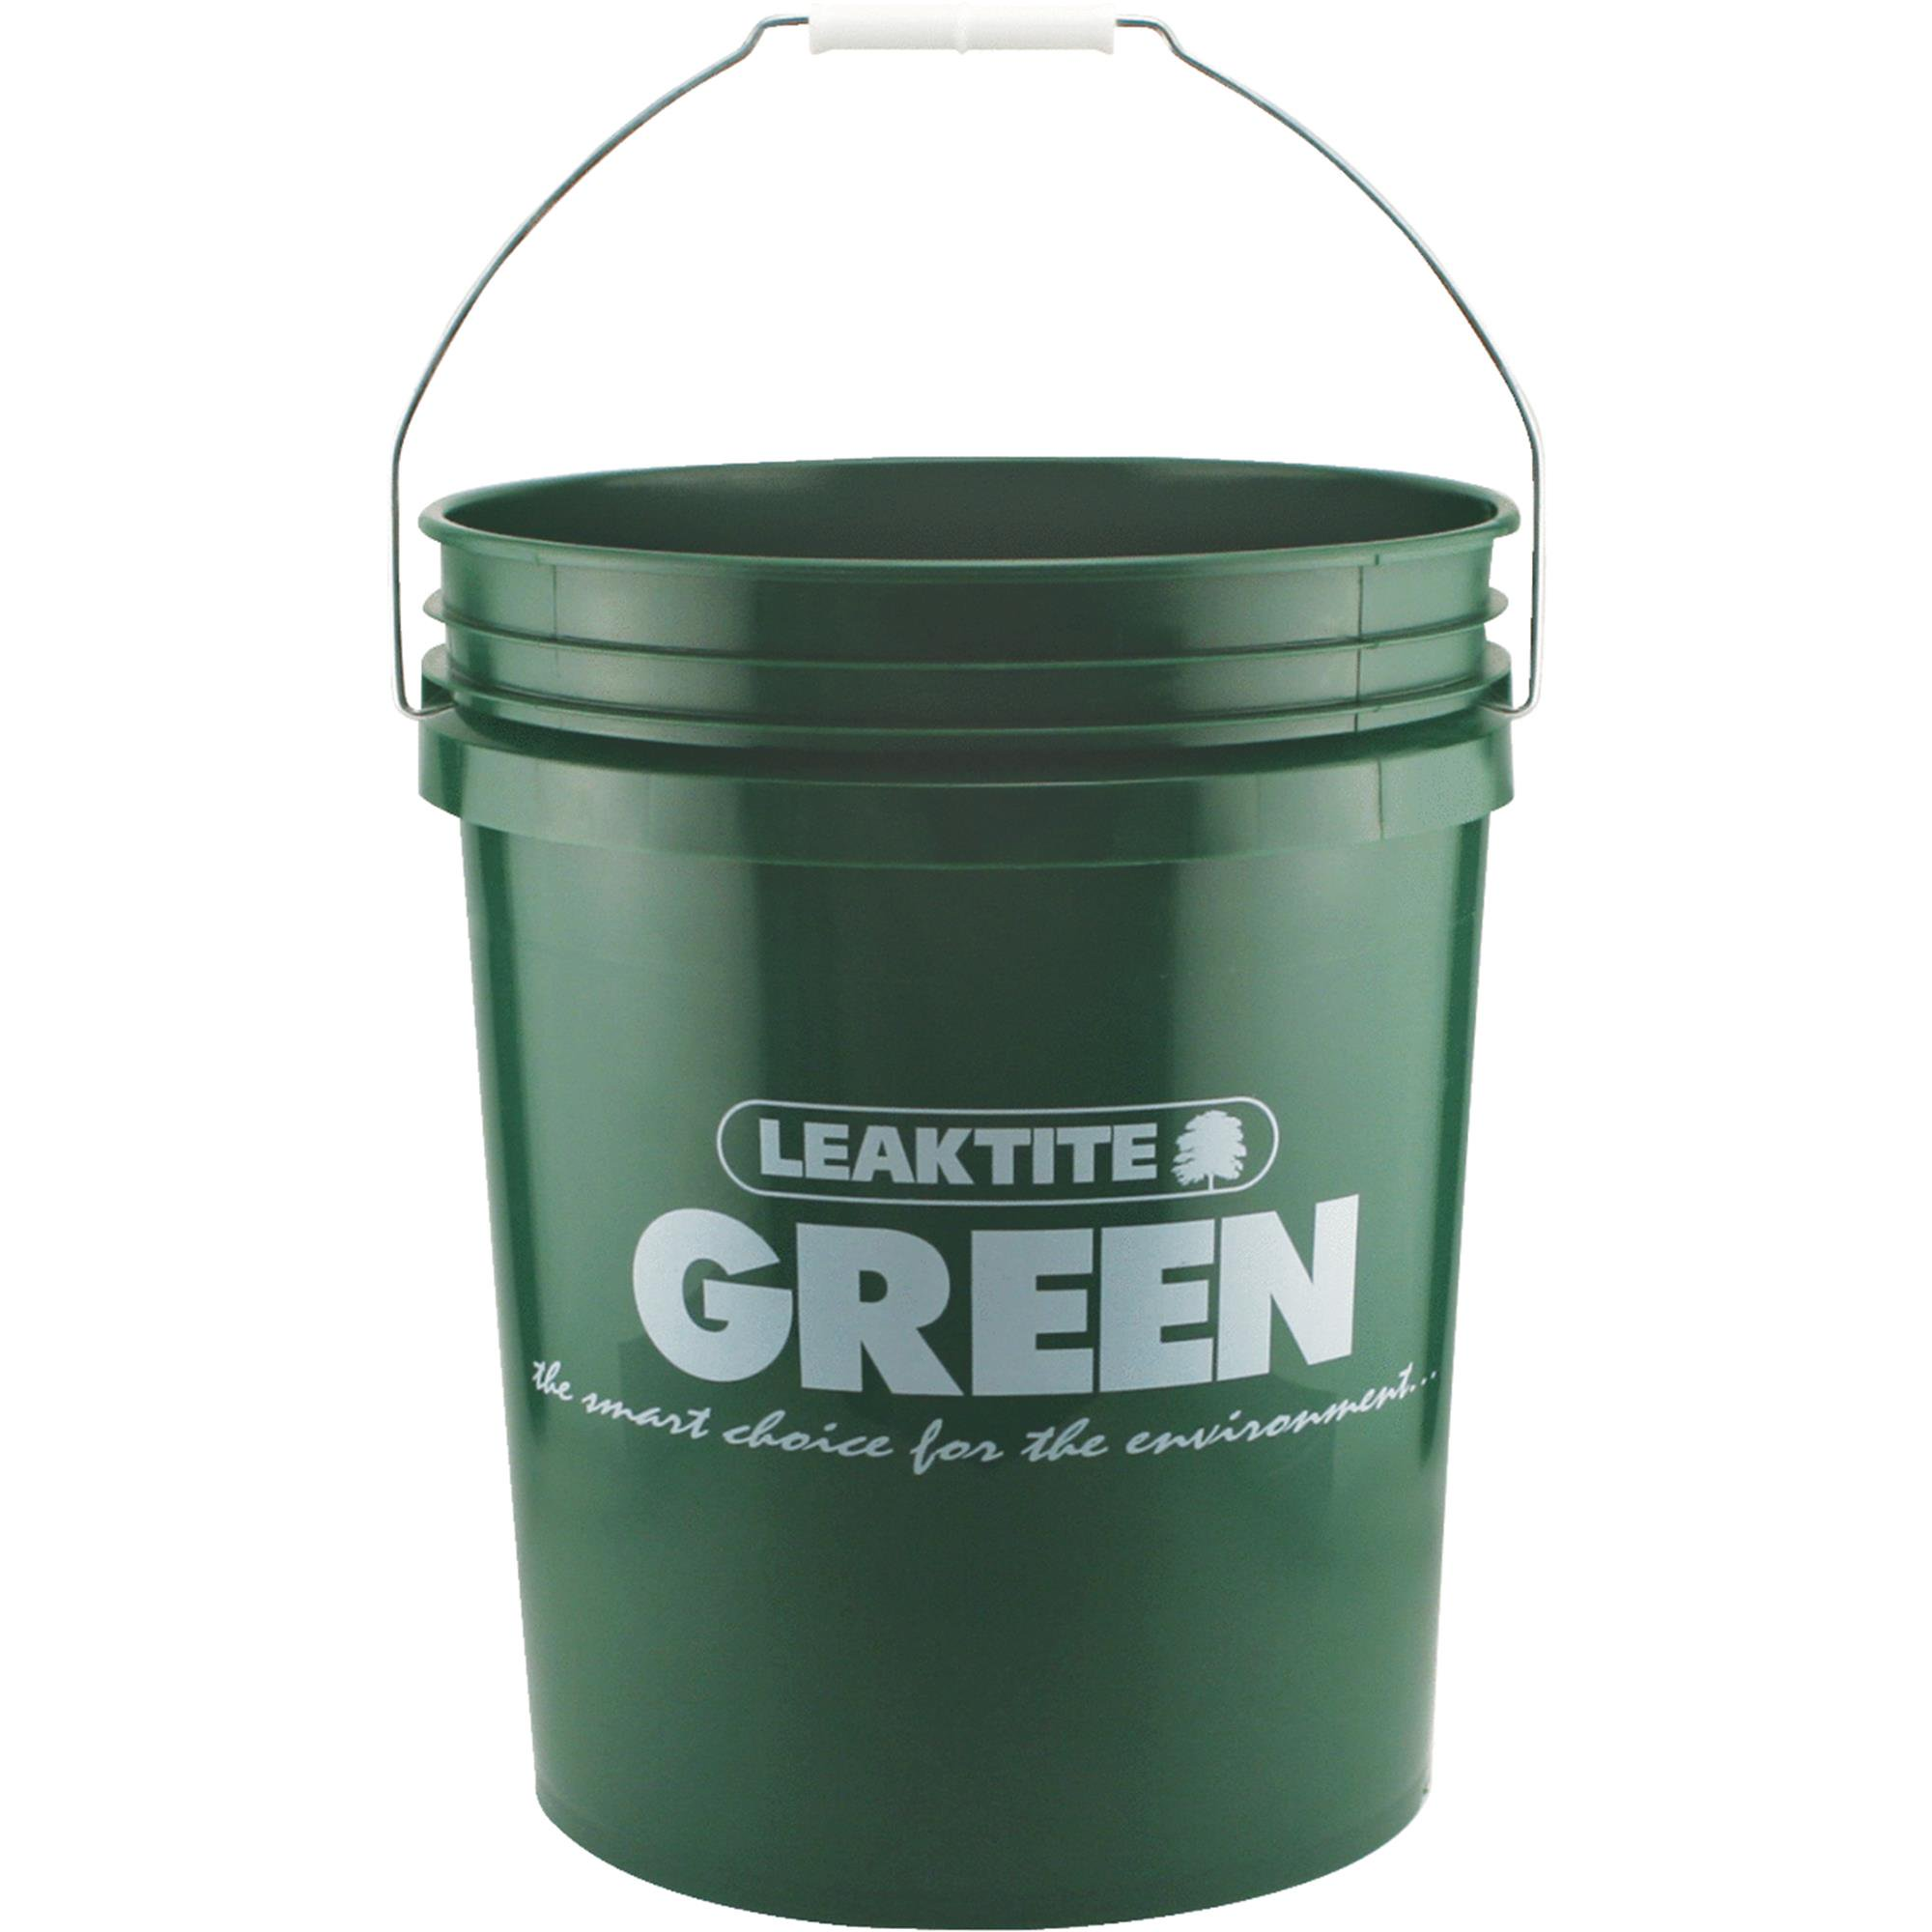 LEAKTITE 5 Gallon Green Plastic Pail 5GLECG